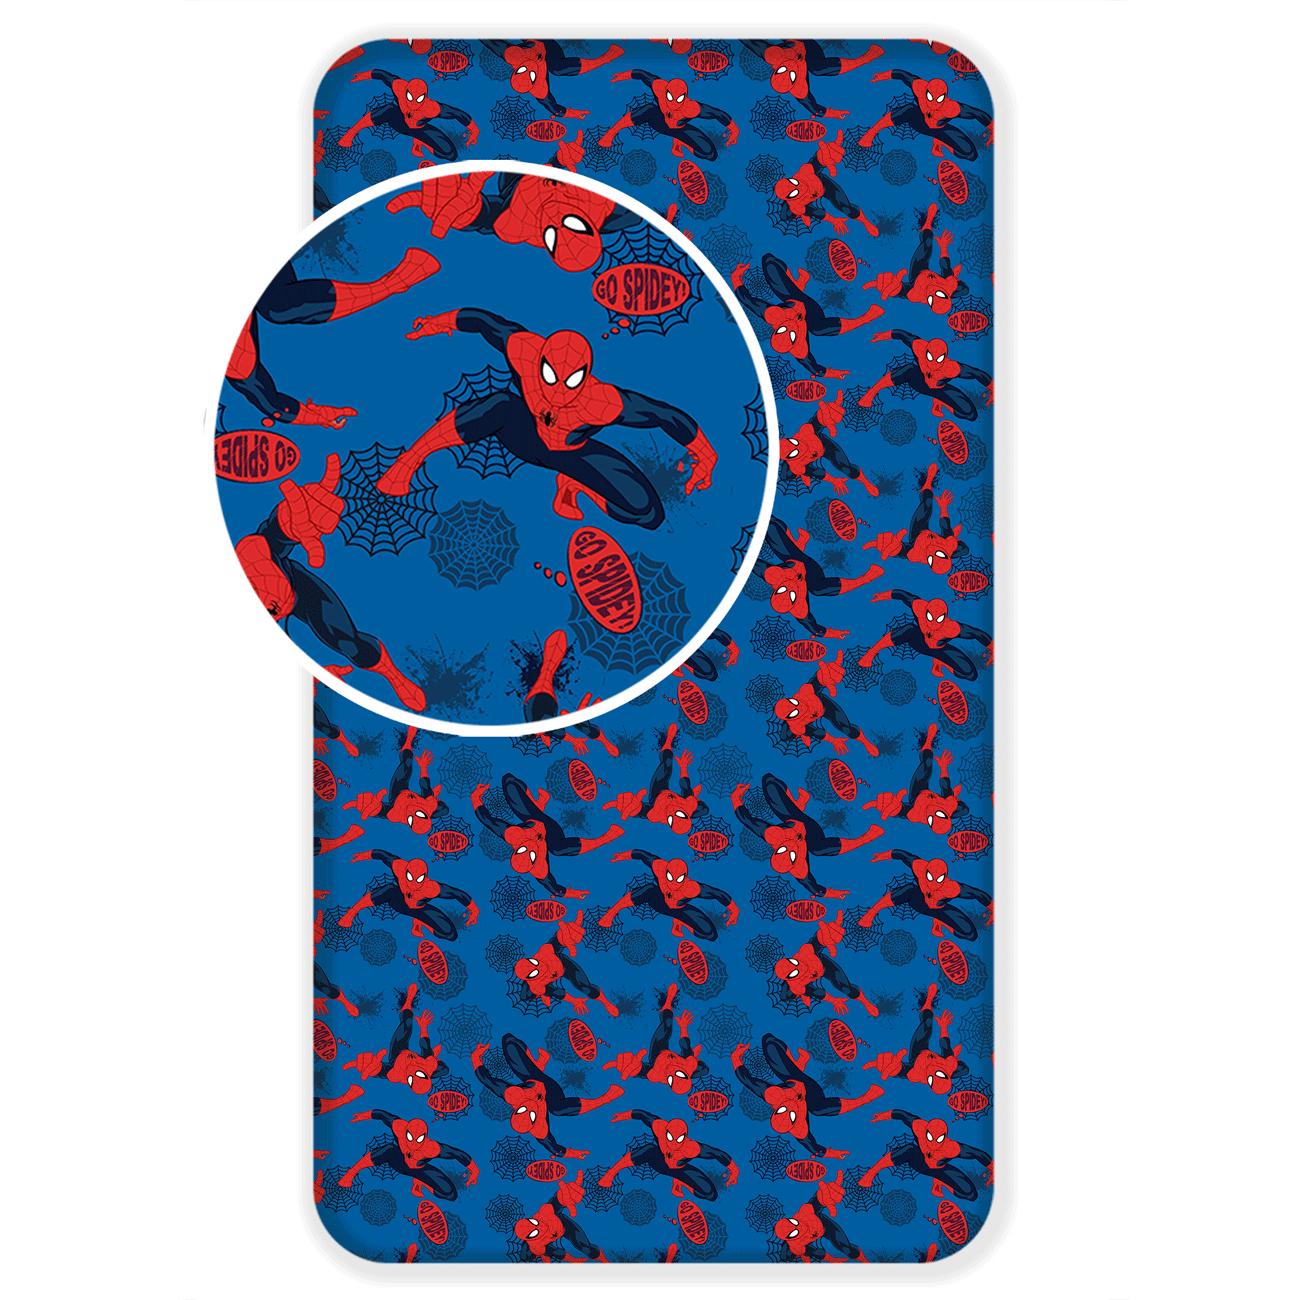 Detská plachta 90x200 SPIDERMAN 2017